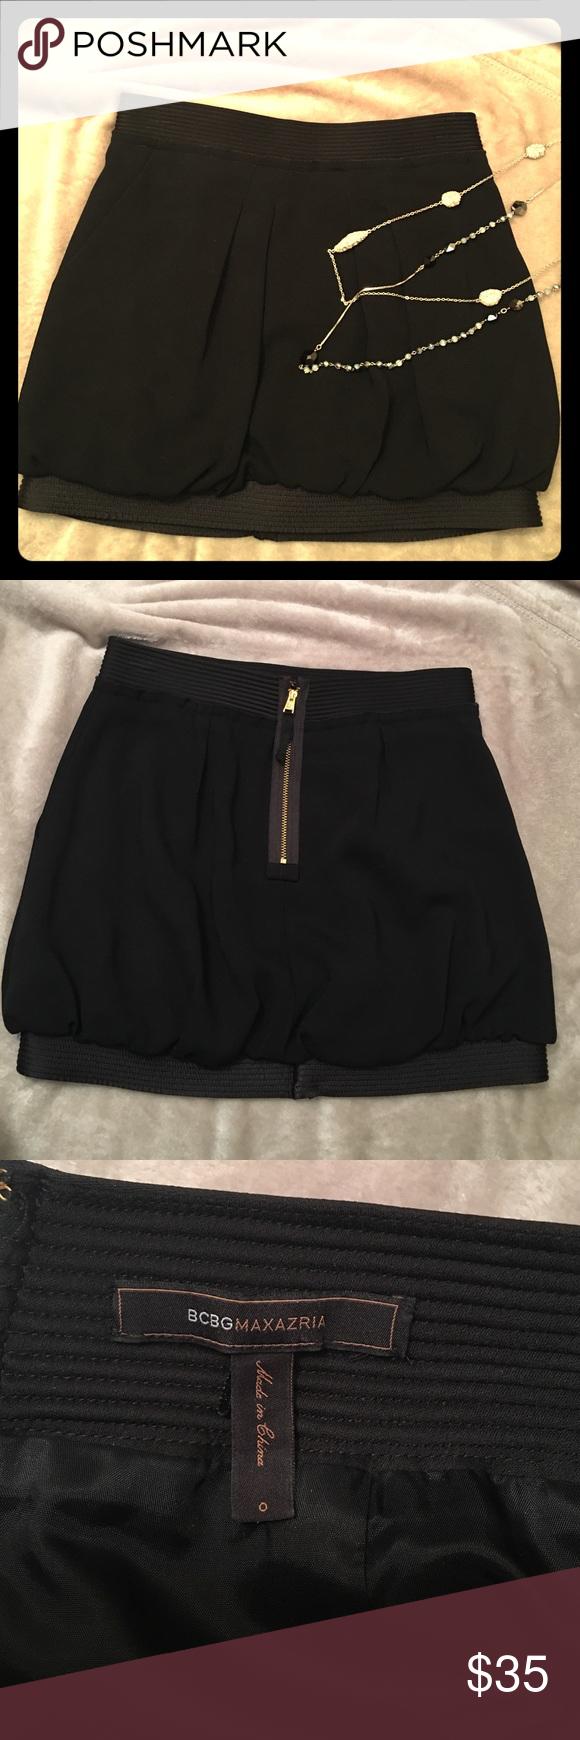 Selling this BCBG Maxazria skirt size 0 on Poshmark! My username is: katya000. #shopmycloset #poshmark #fashion #shopping #style #forsale #BCBGMaxAzria #Dresses & Skirts